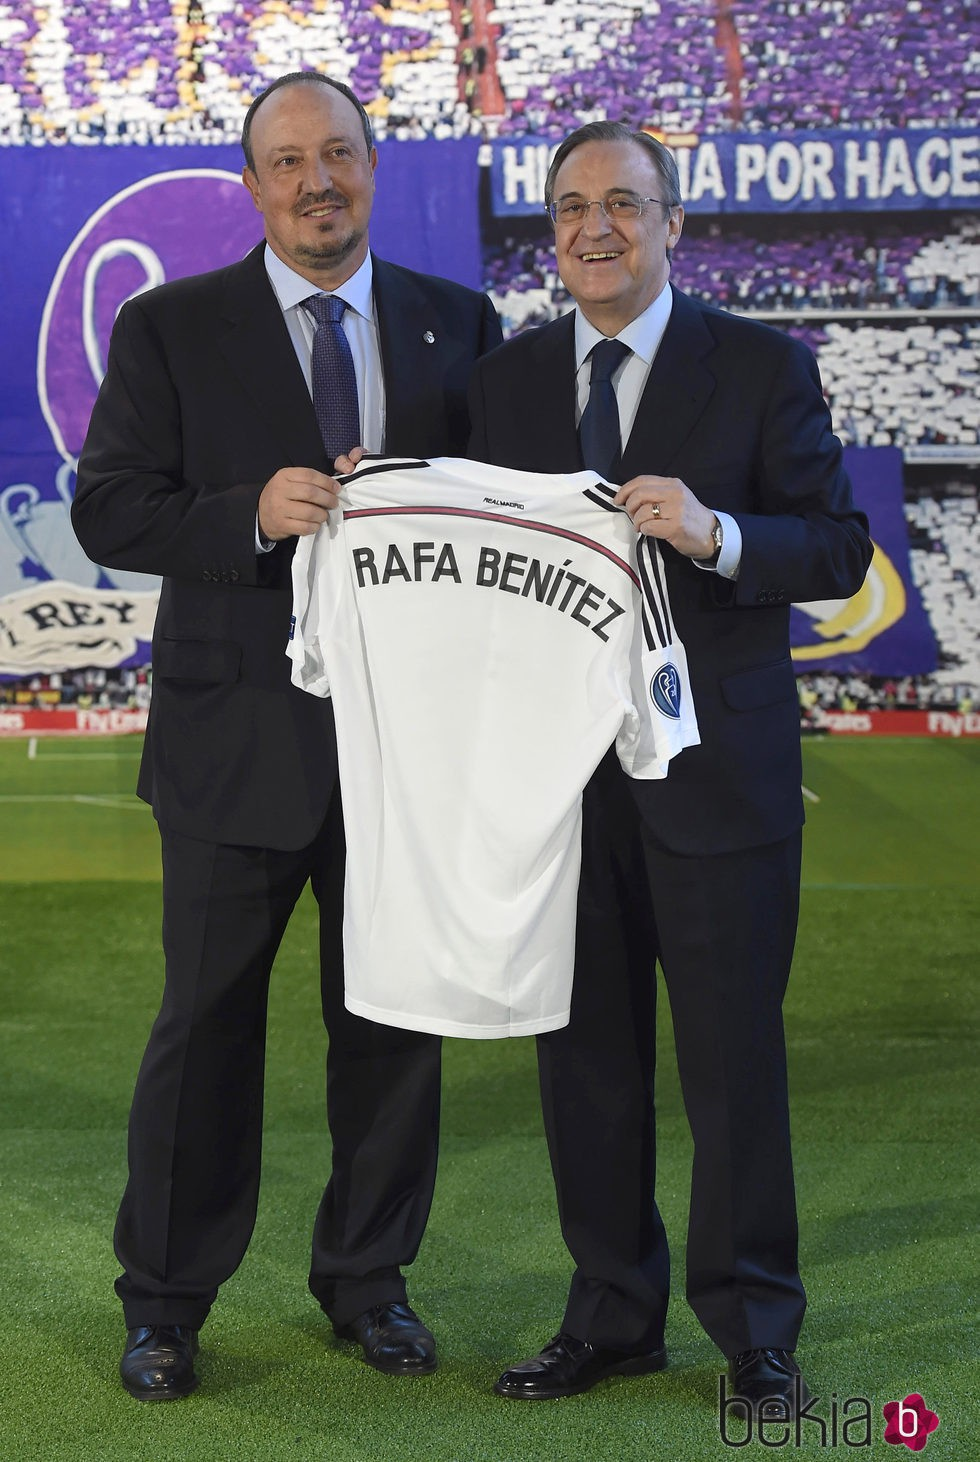 ¿Cuánto mide Rafa Benítez? - Altura - Real height 76251_rafa-benitez-florentino-perez-presentacion-entrenador-real-madrid